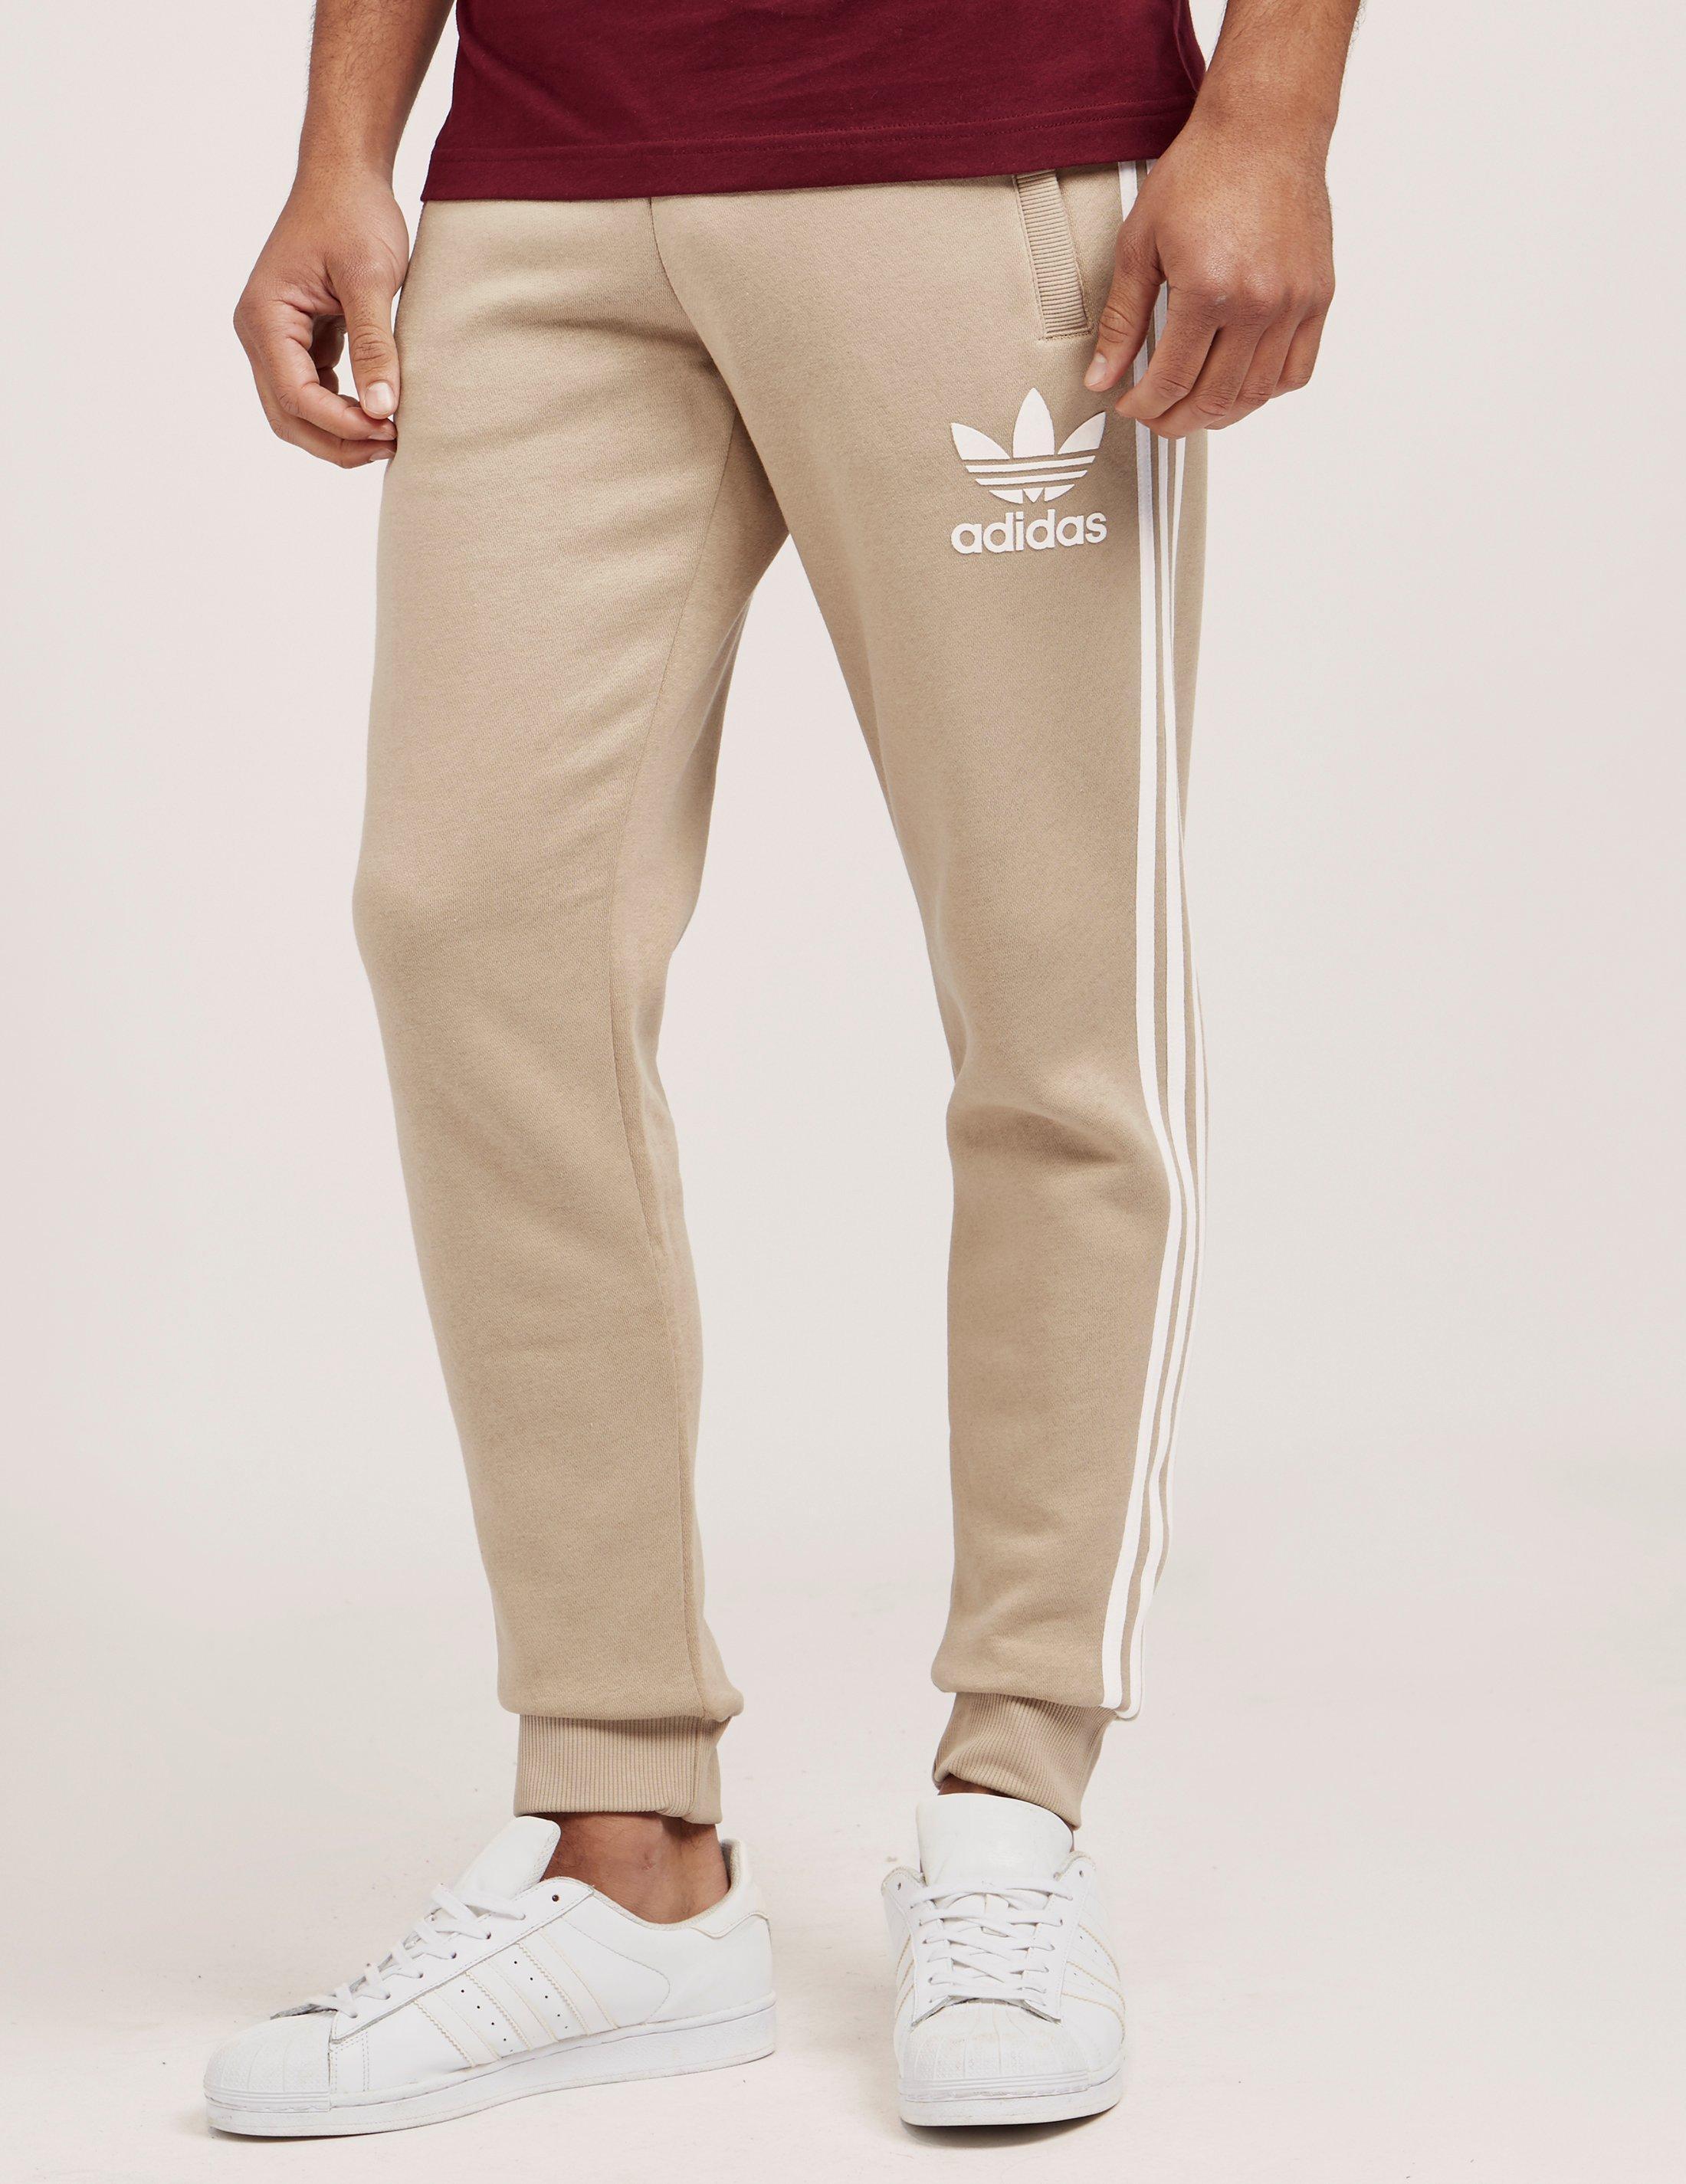 8b27904bd0 adidas Originals Mens California Cuffed Track Pants Stone/white ...